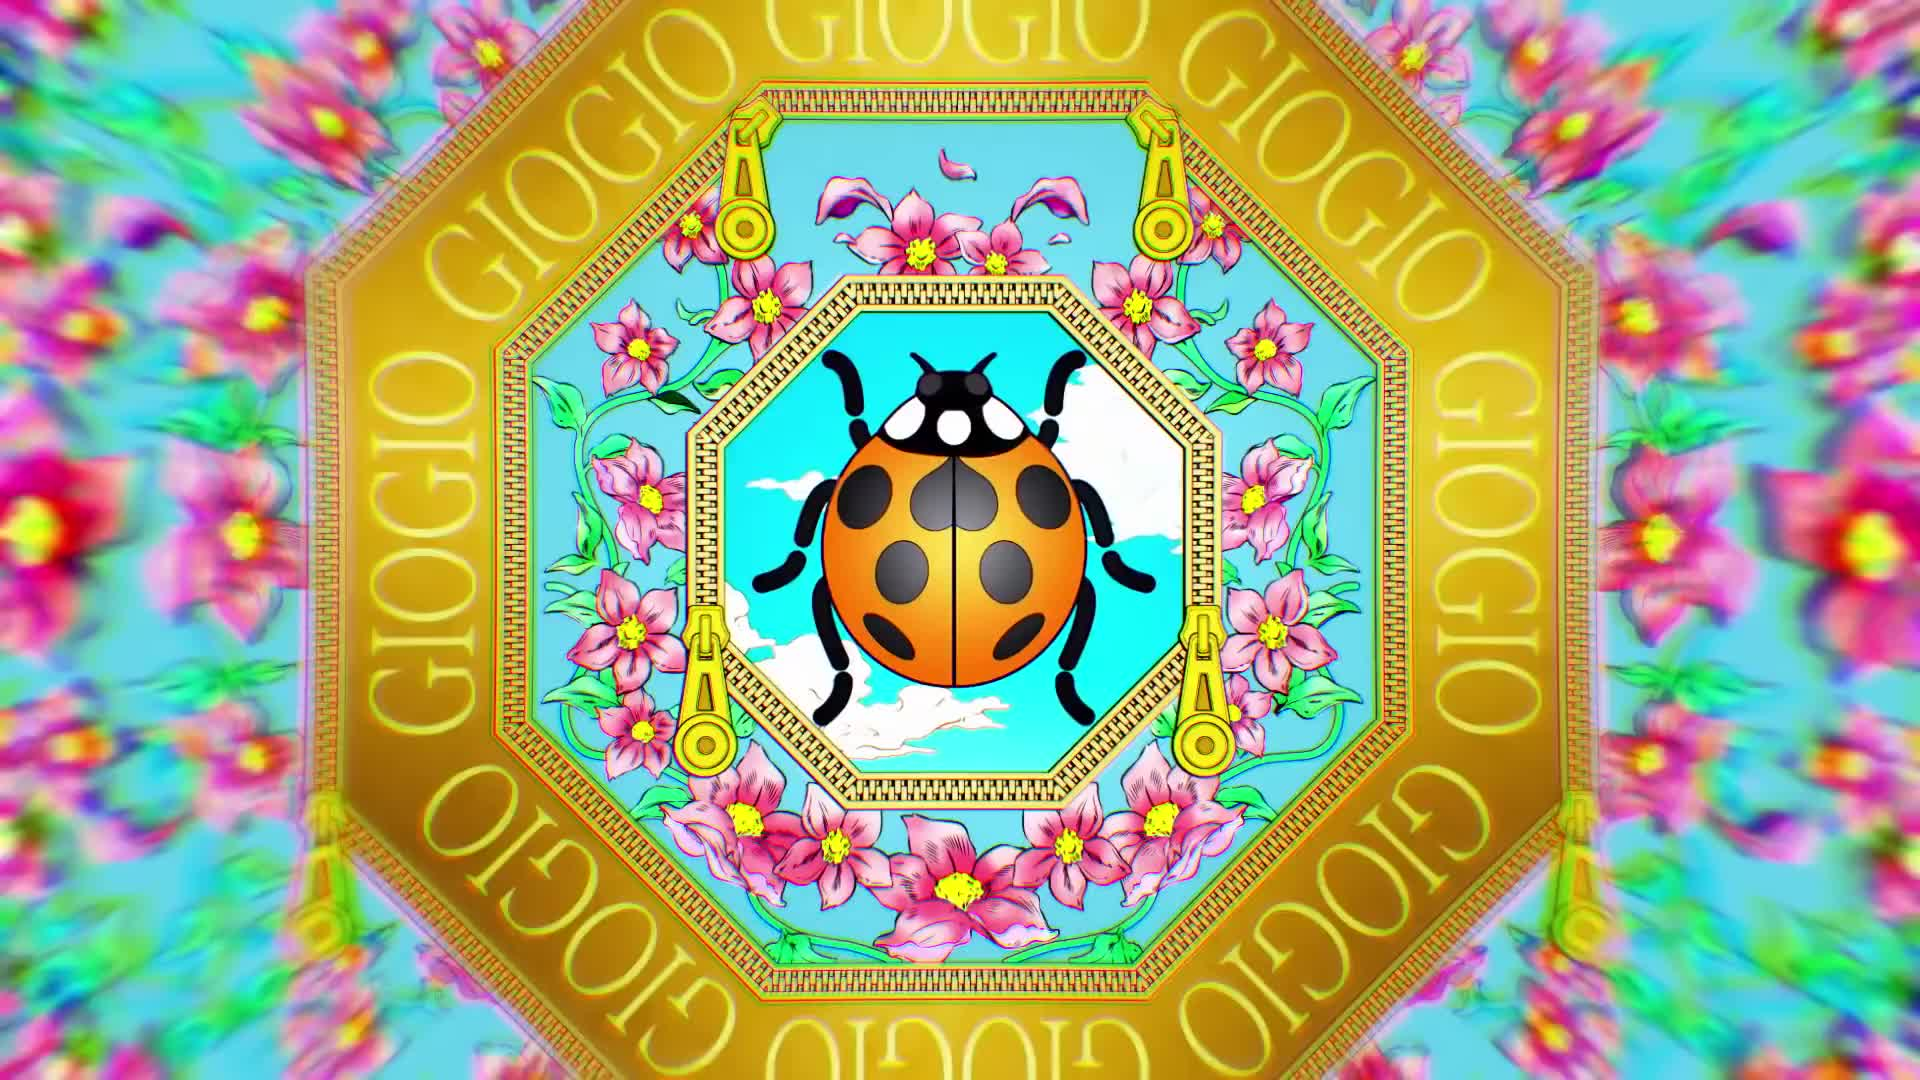 Jojo S Bizarre Adventure Part 5 Golden Wind Pv Narancia Ghirga